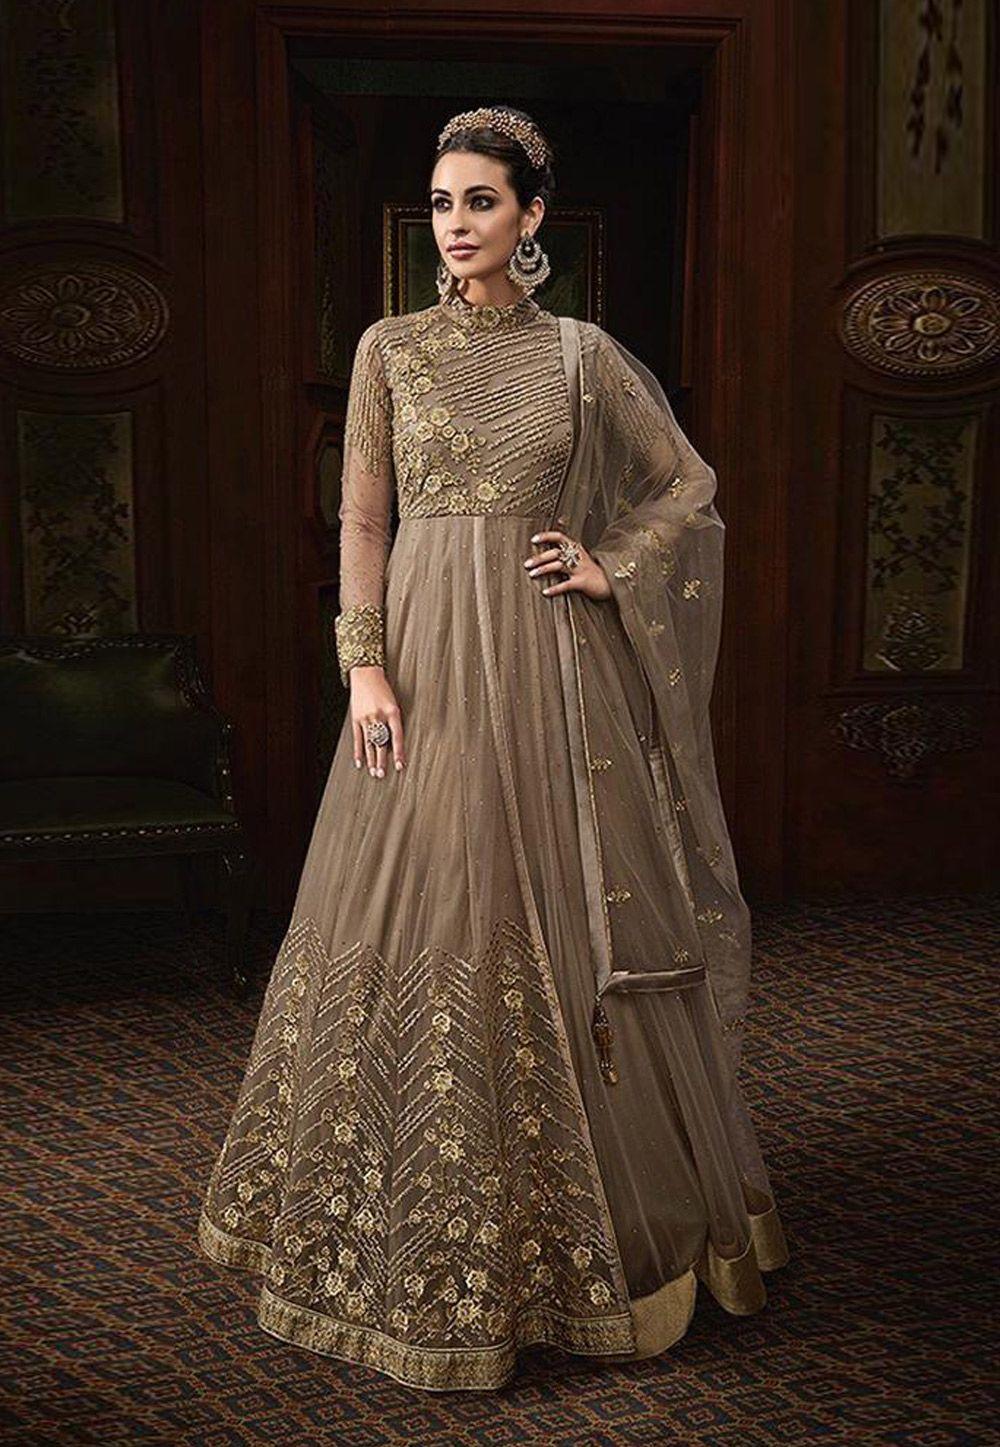 694525fd30 Buy Beige Net Abaya Style Anarkali Suit 163355 online at lowest price from  huge collection of salwar kameez at Indianclothstore.com.